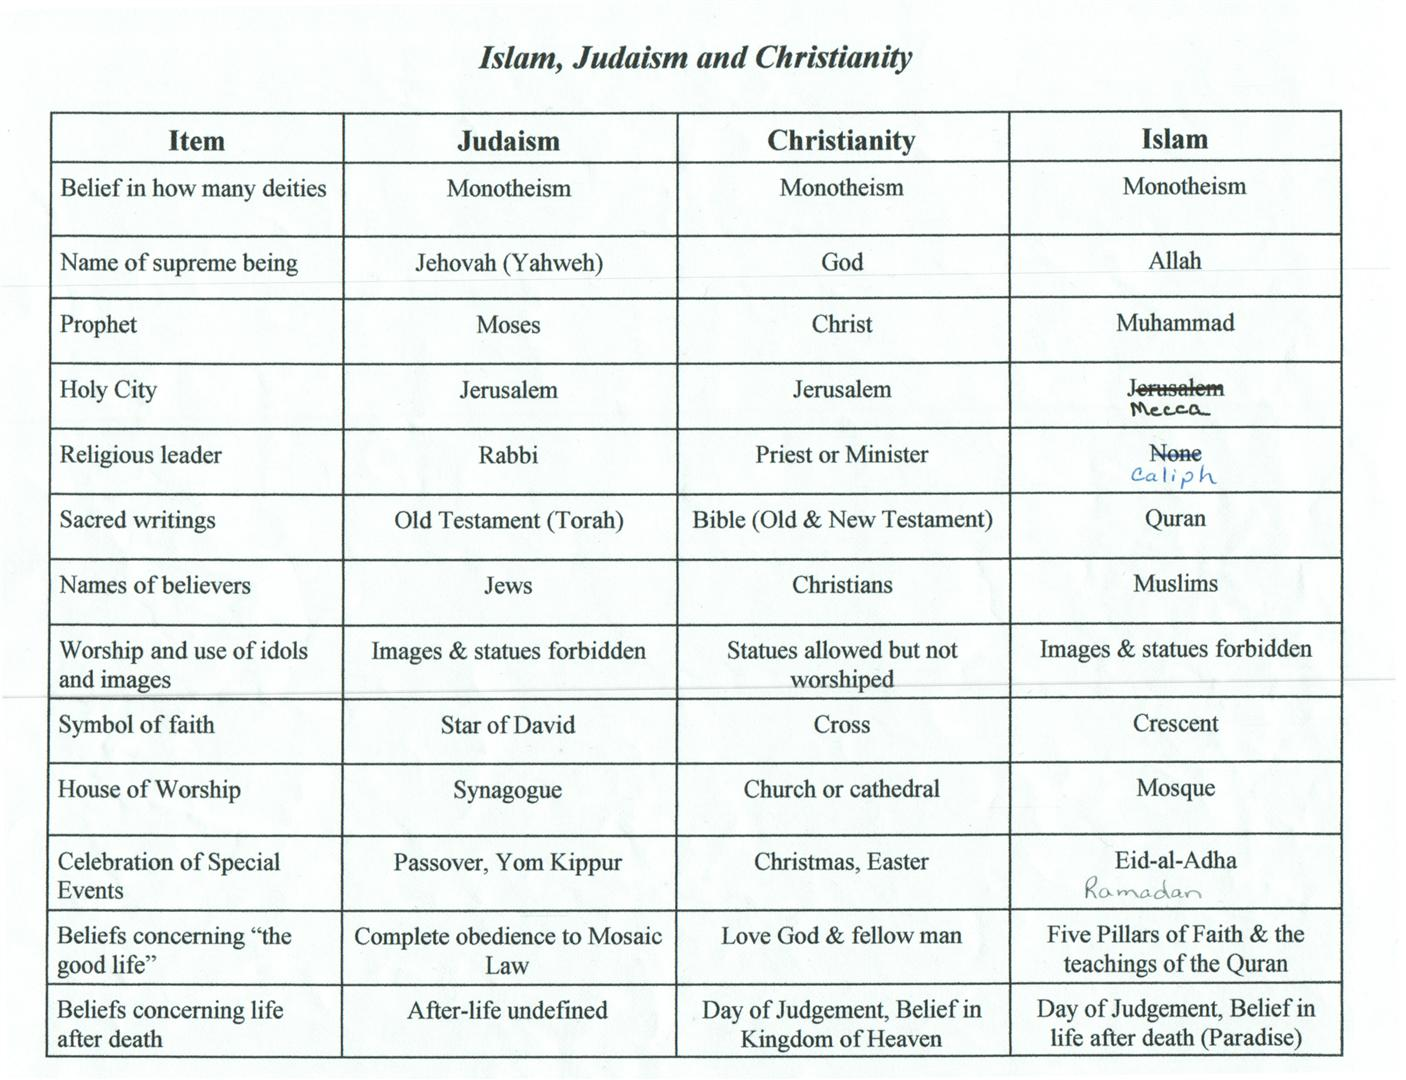 christianity vs islam venn diagram 92 wrangler radio wiring judaism philosophy and religion